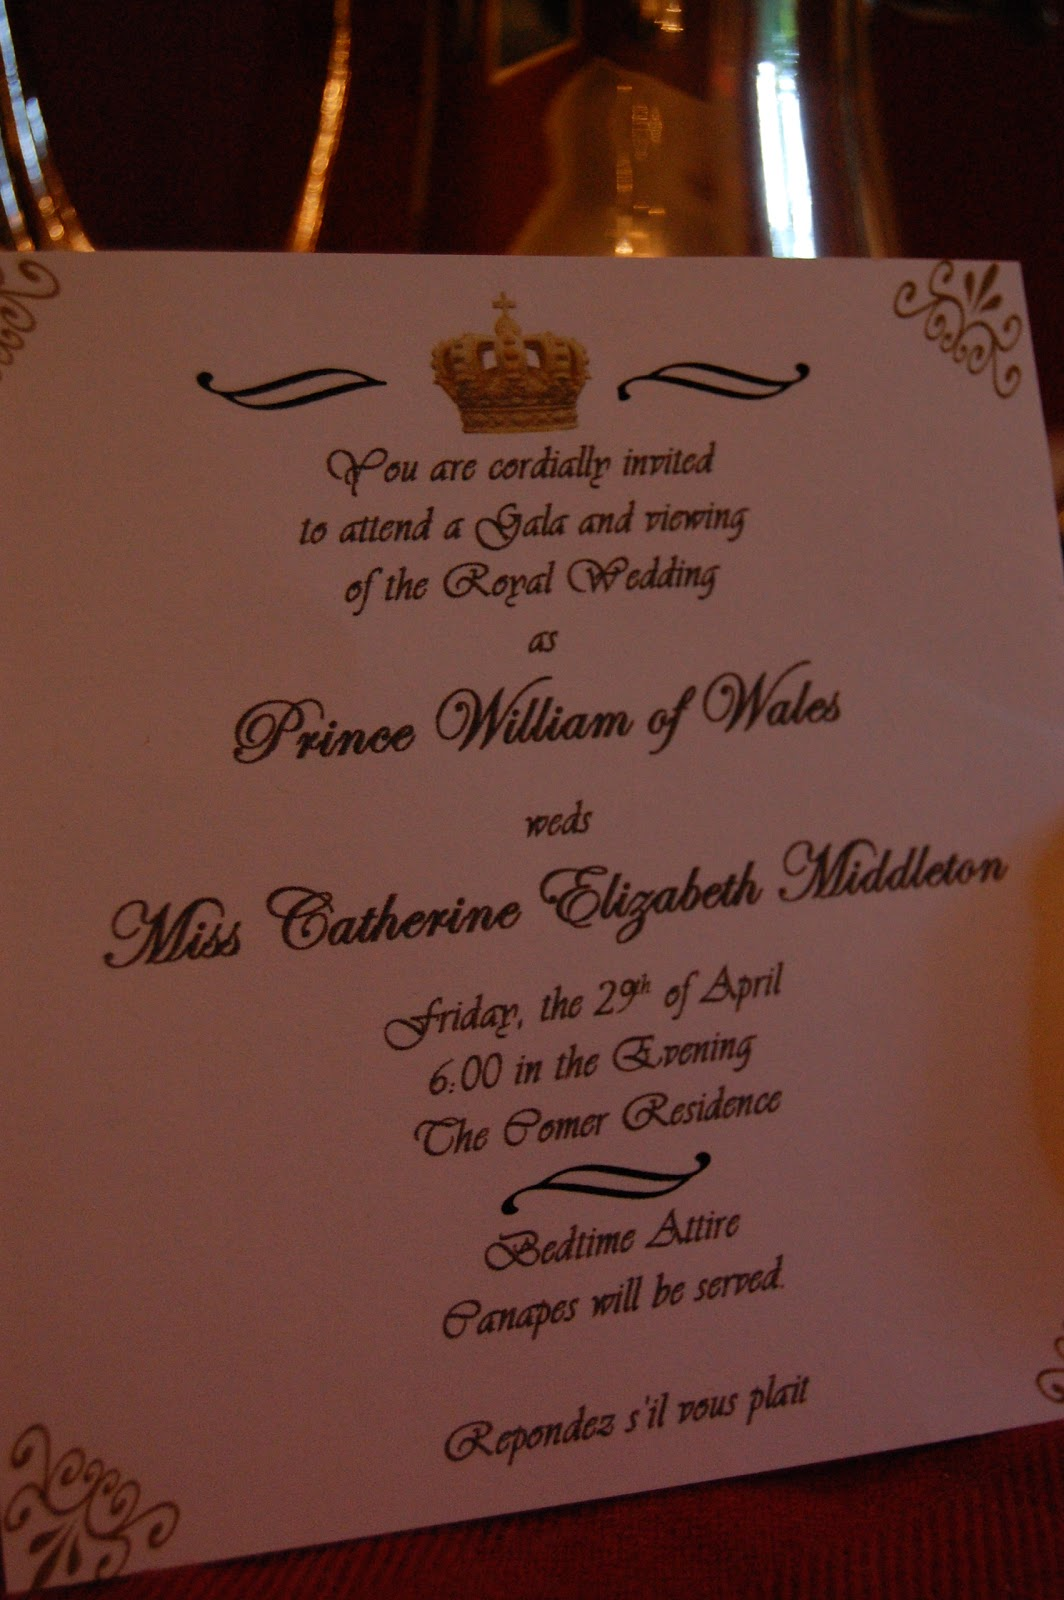 Long Party of Five: A Royal Wedding Celebration